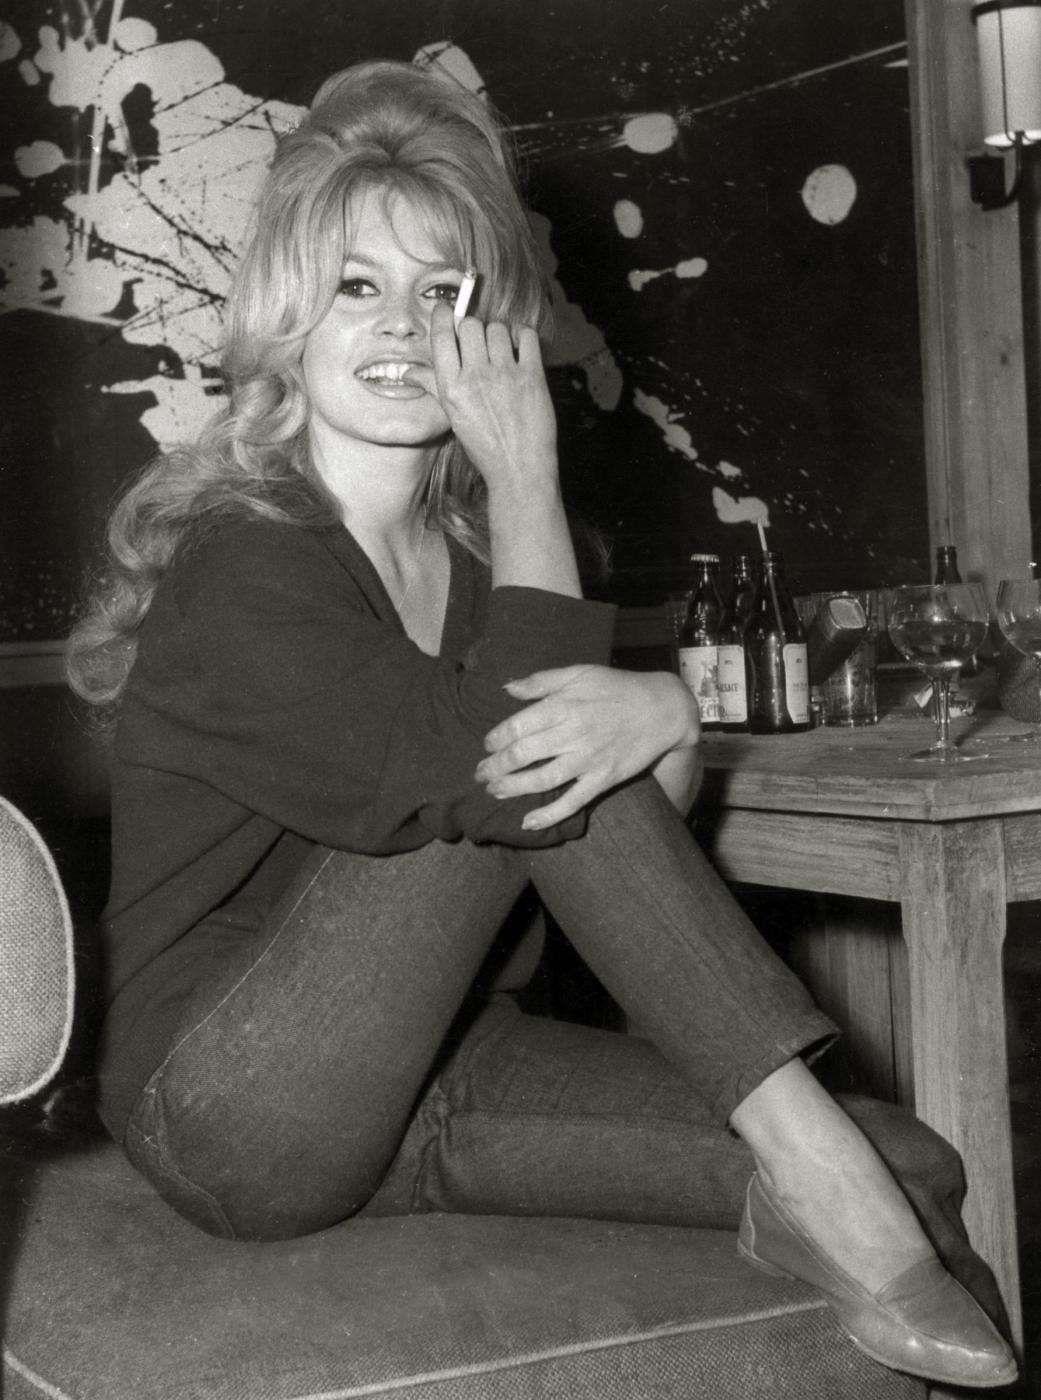 Moda anni 60 - Moda Anni 60 Brigitte Bardot | Bridget ...